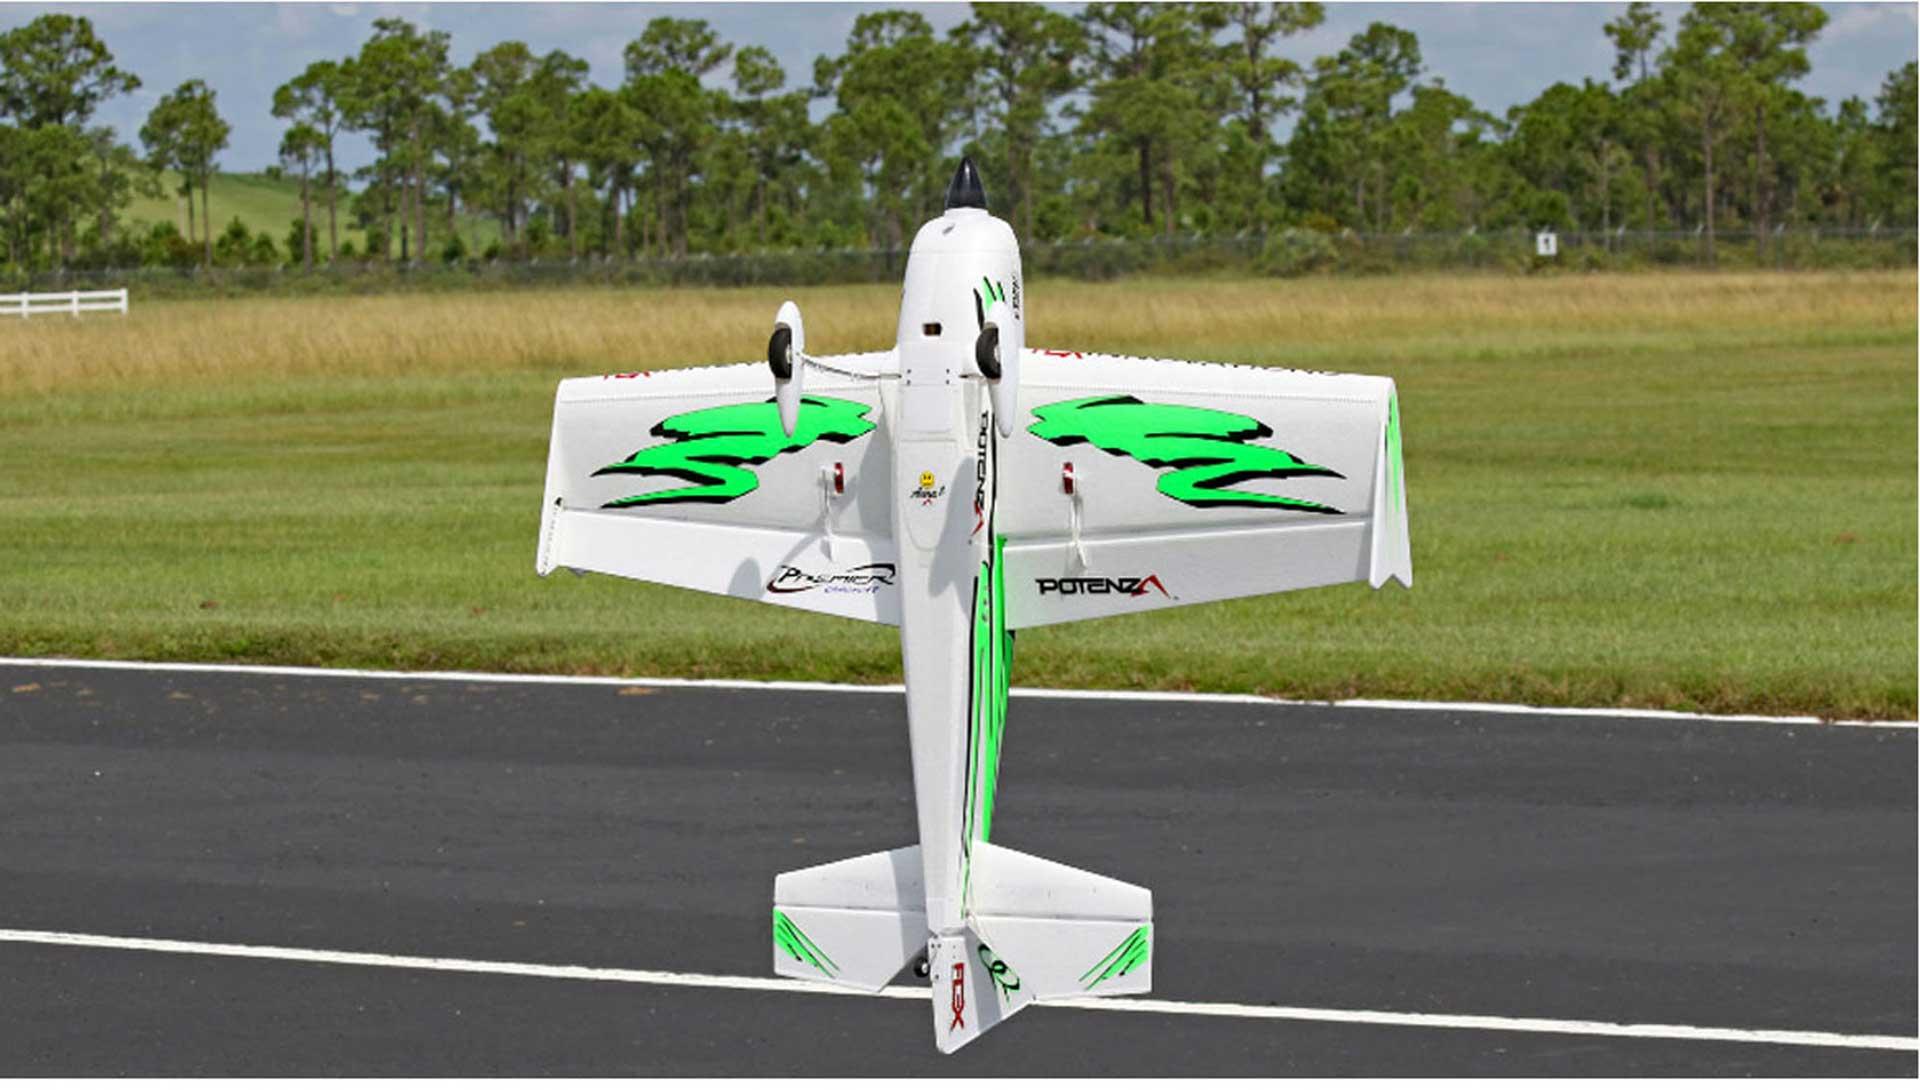 PREMIER AIRCRAFT QQ EXTRA 300 V2 GREEN/BLACK SUPER PNP WITH AURA 8